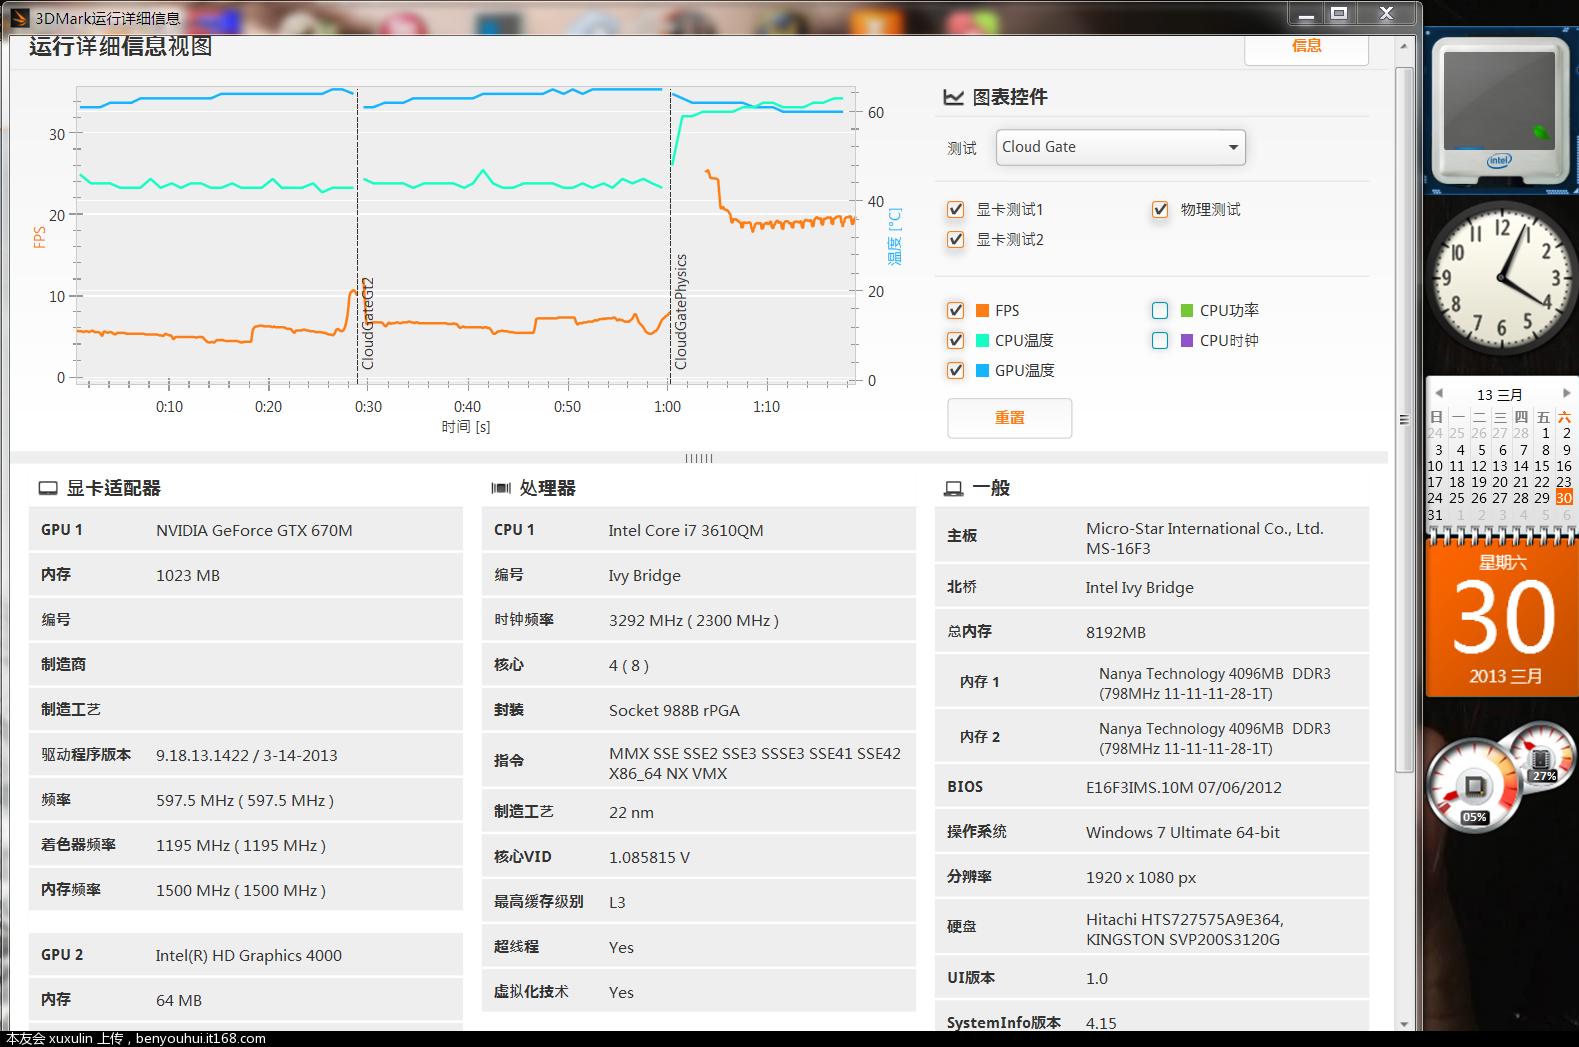 11-2、Cloud Gate 测试自定义设置1080P所有最高运行信息.PNG